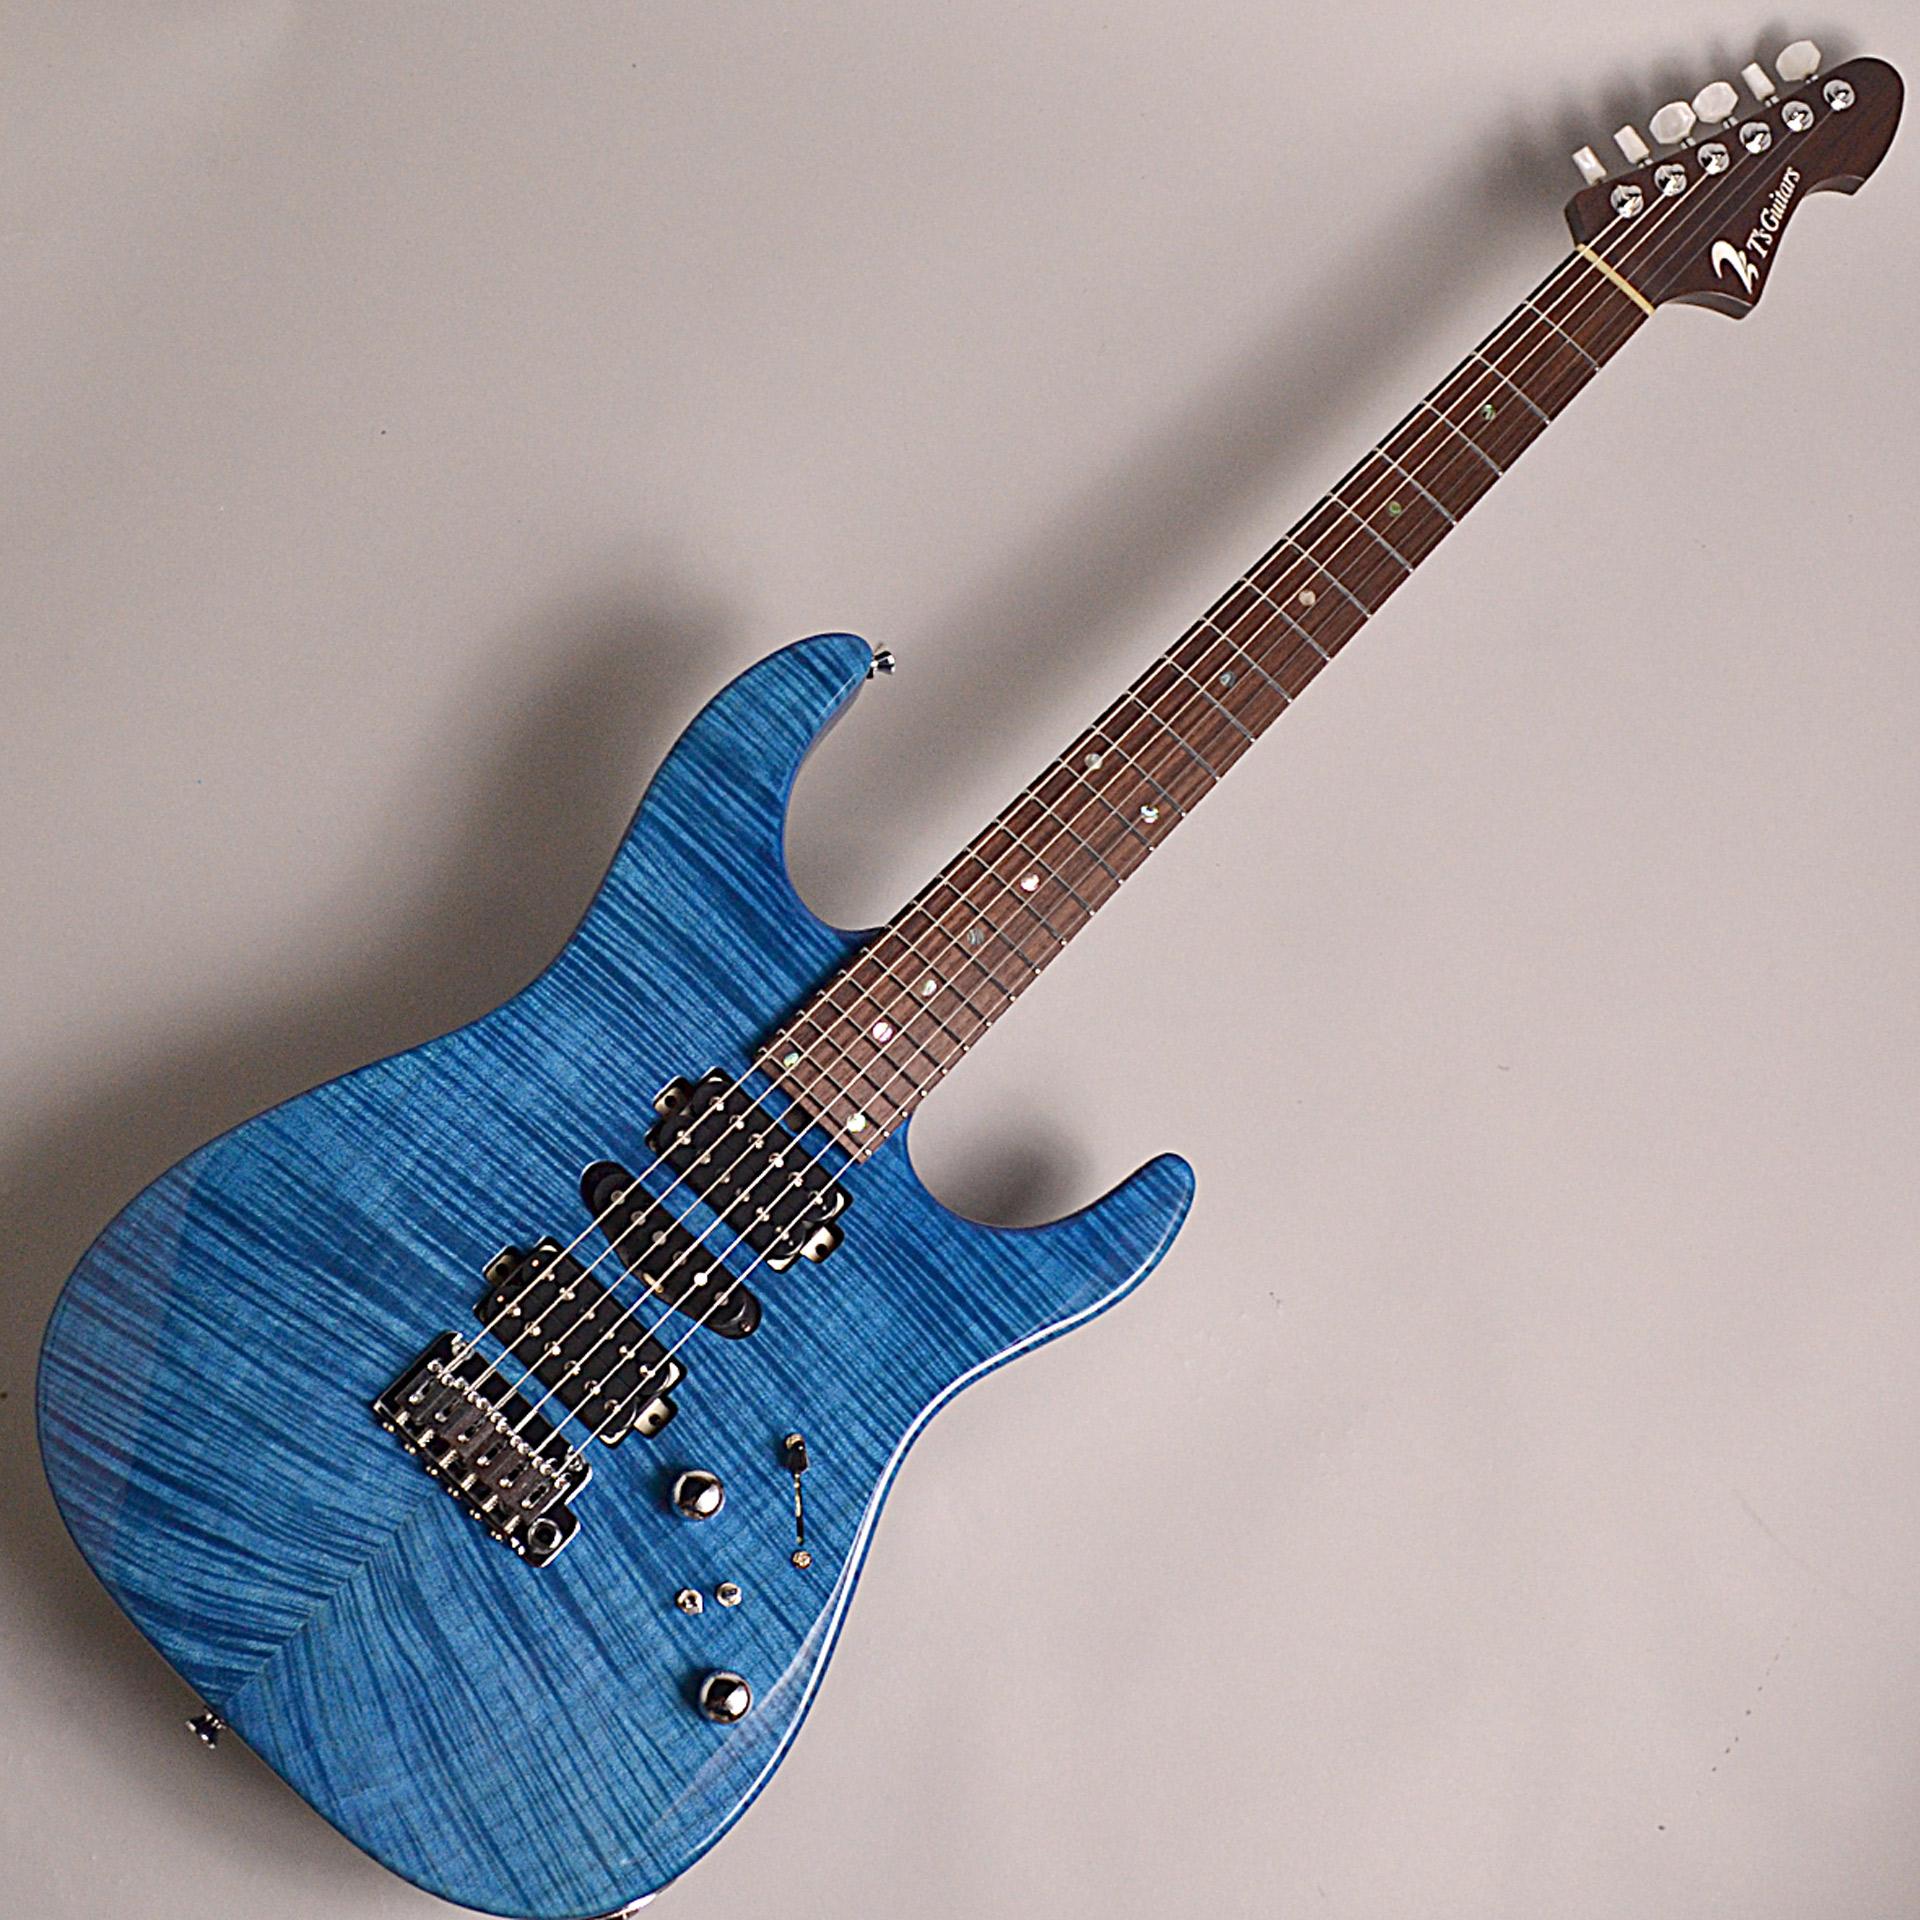 T's Guitars T's Guitars DST24 Custom Made Arcti... 写真画像